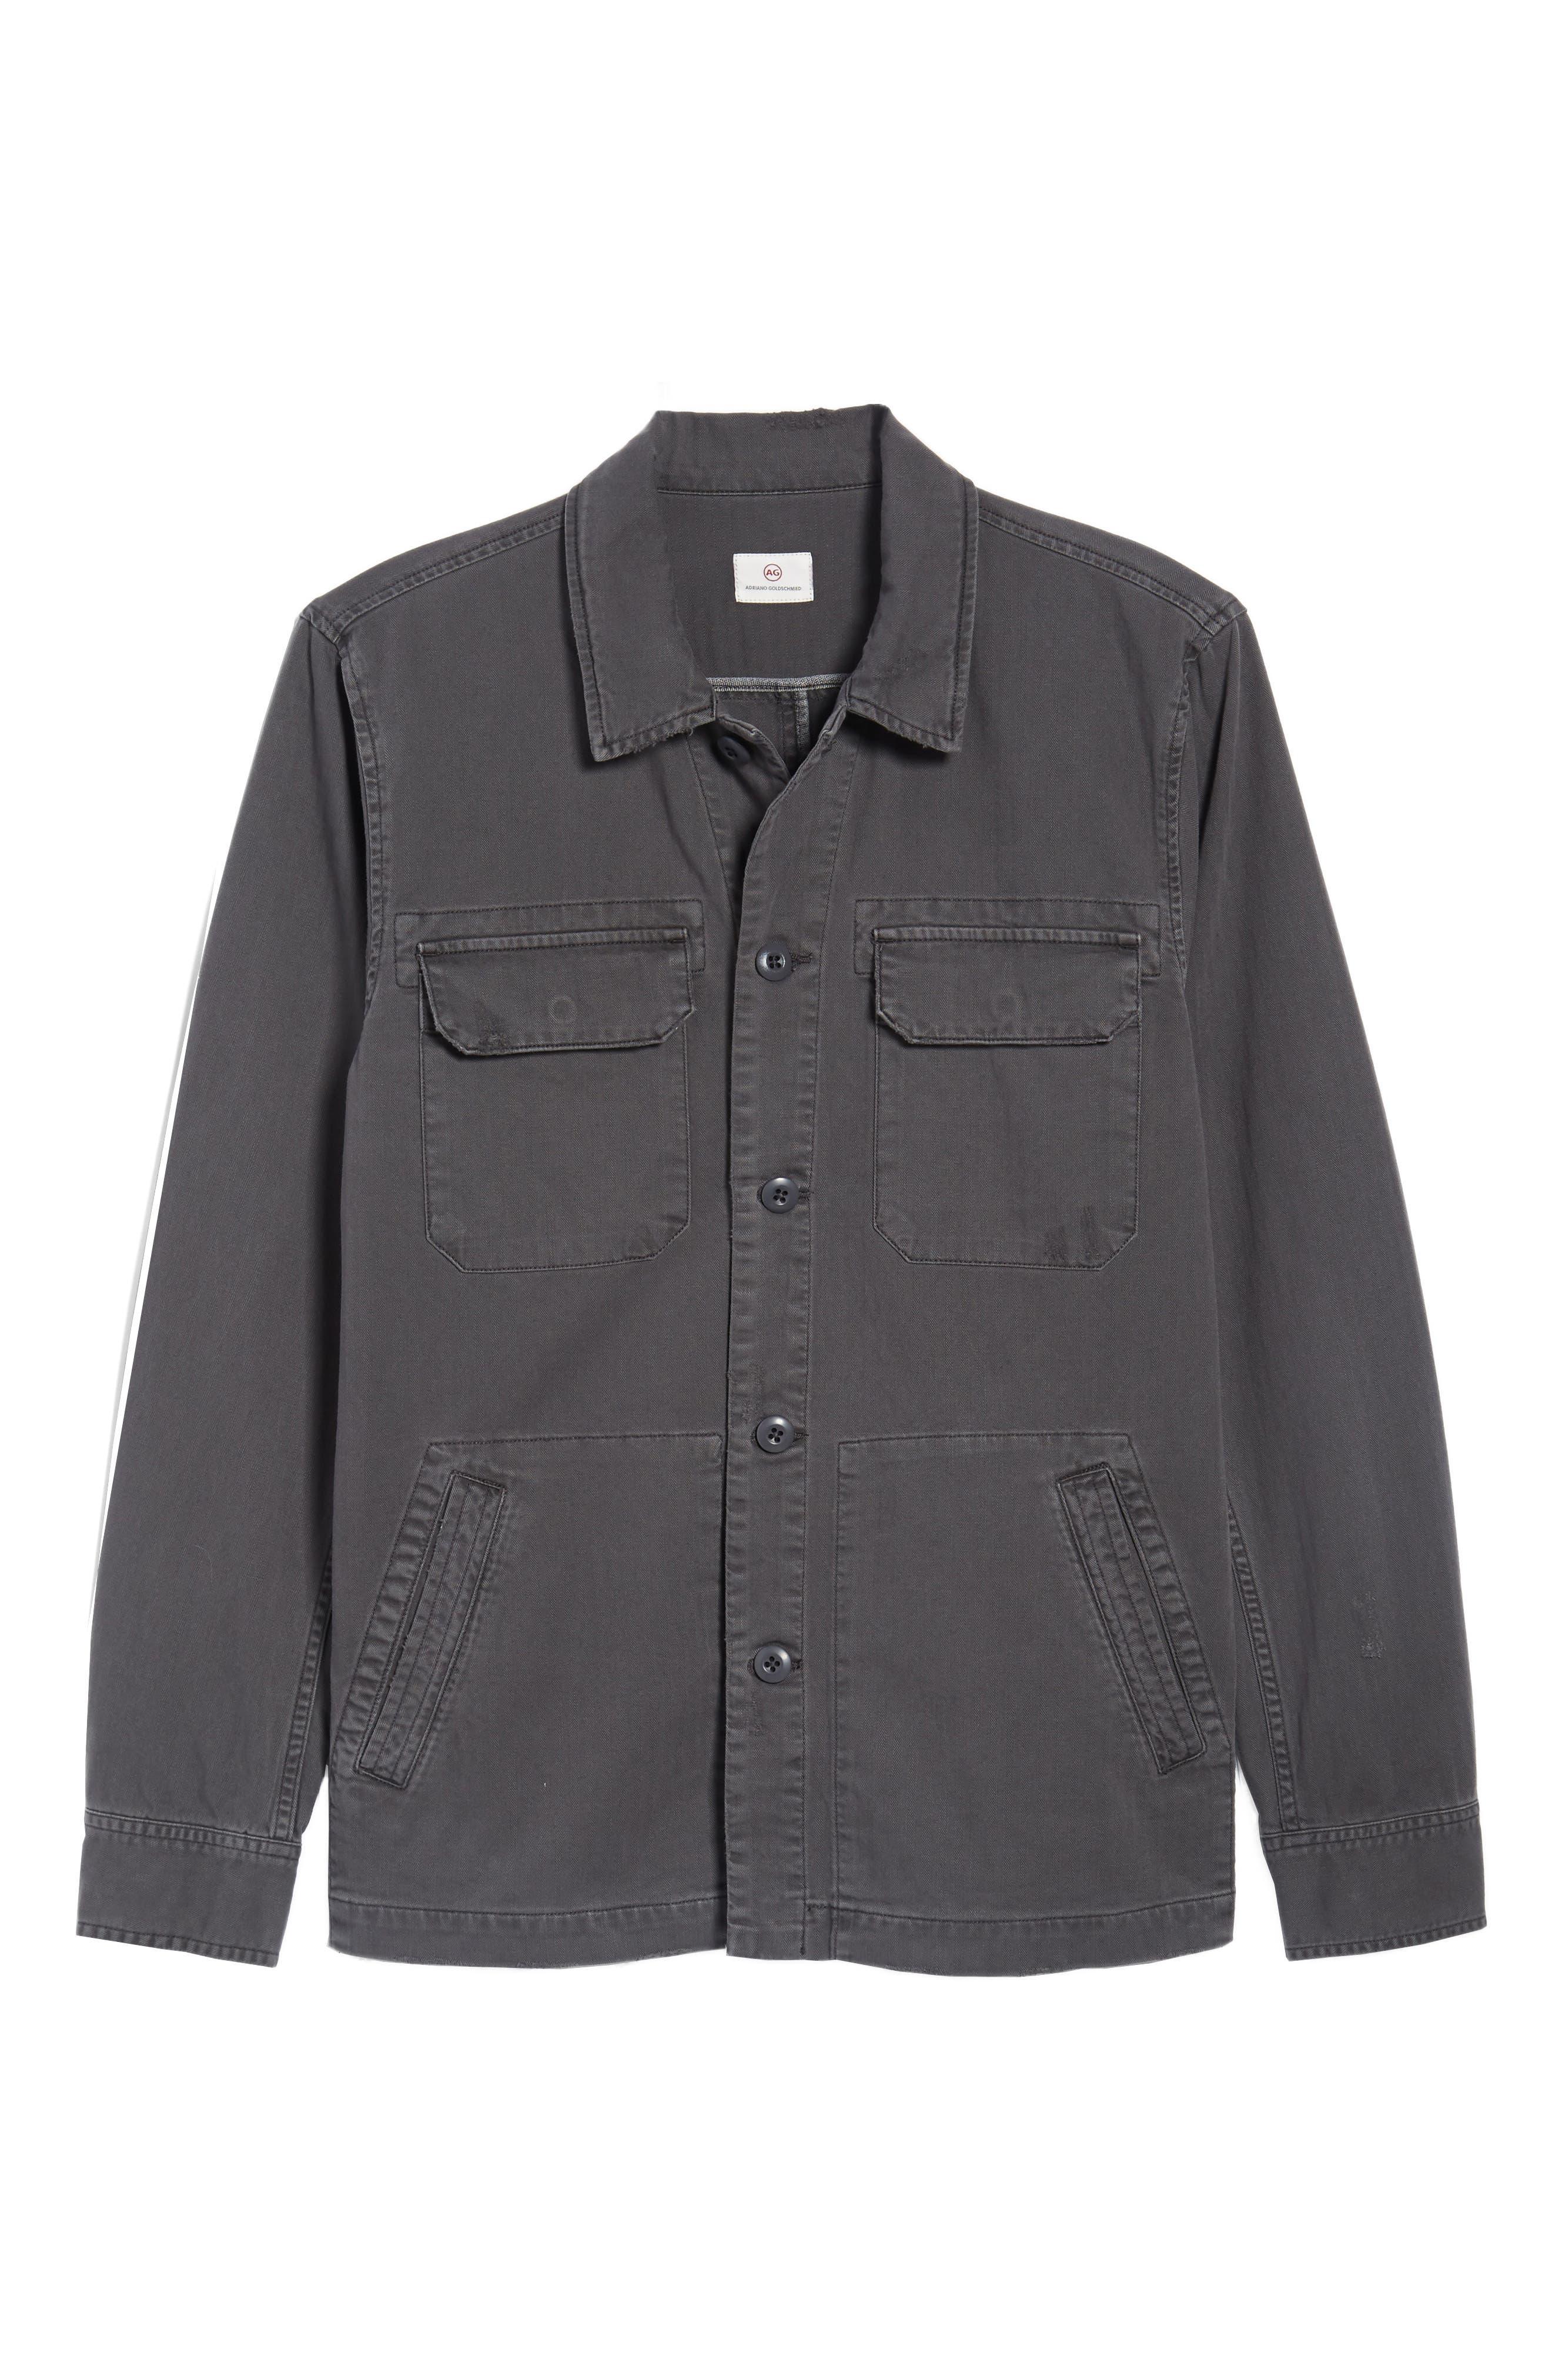 Marx Slim Fit Jacket,                             Alternate thumbnail 6, color,                             5 Years Pigment Smoke Grey